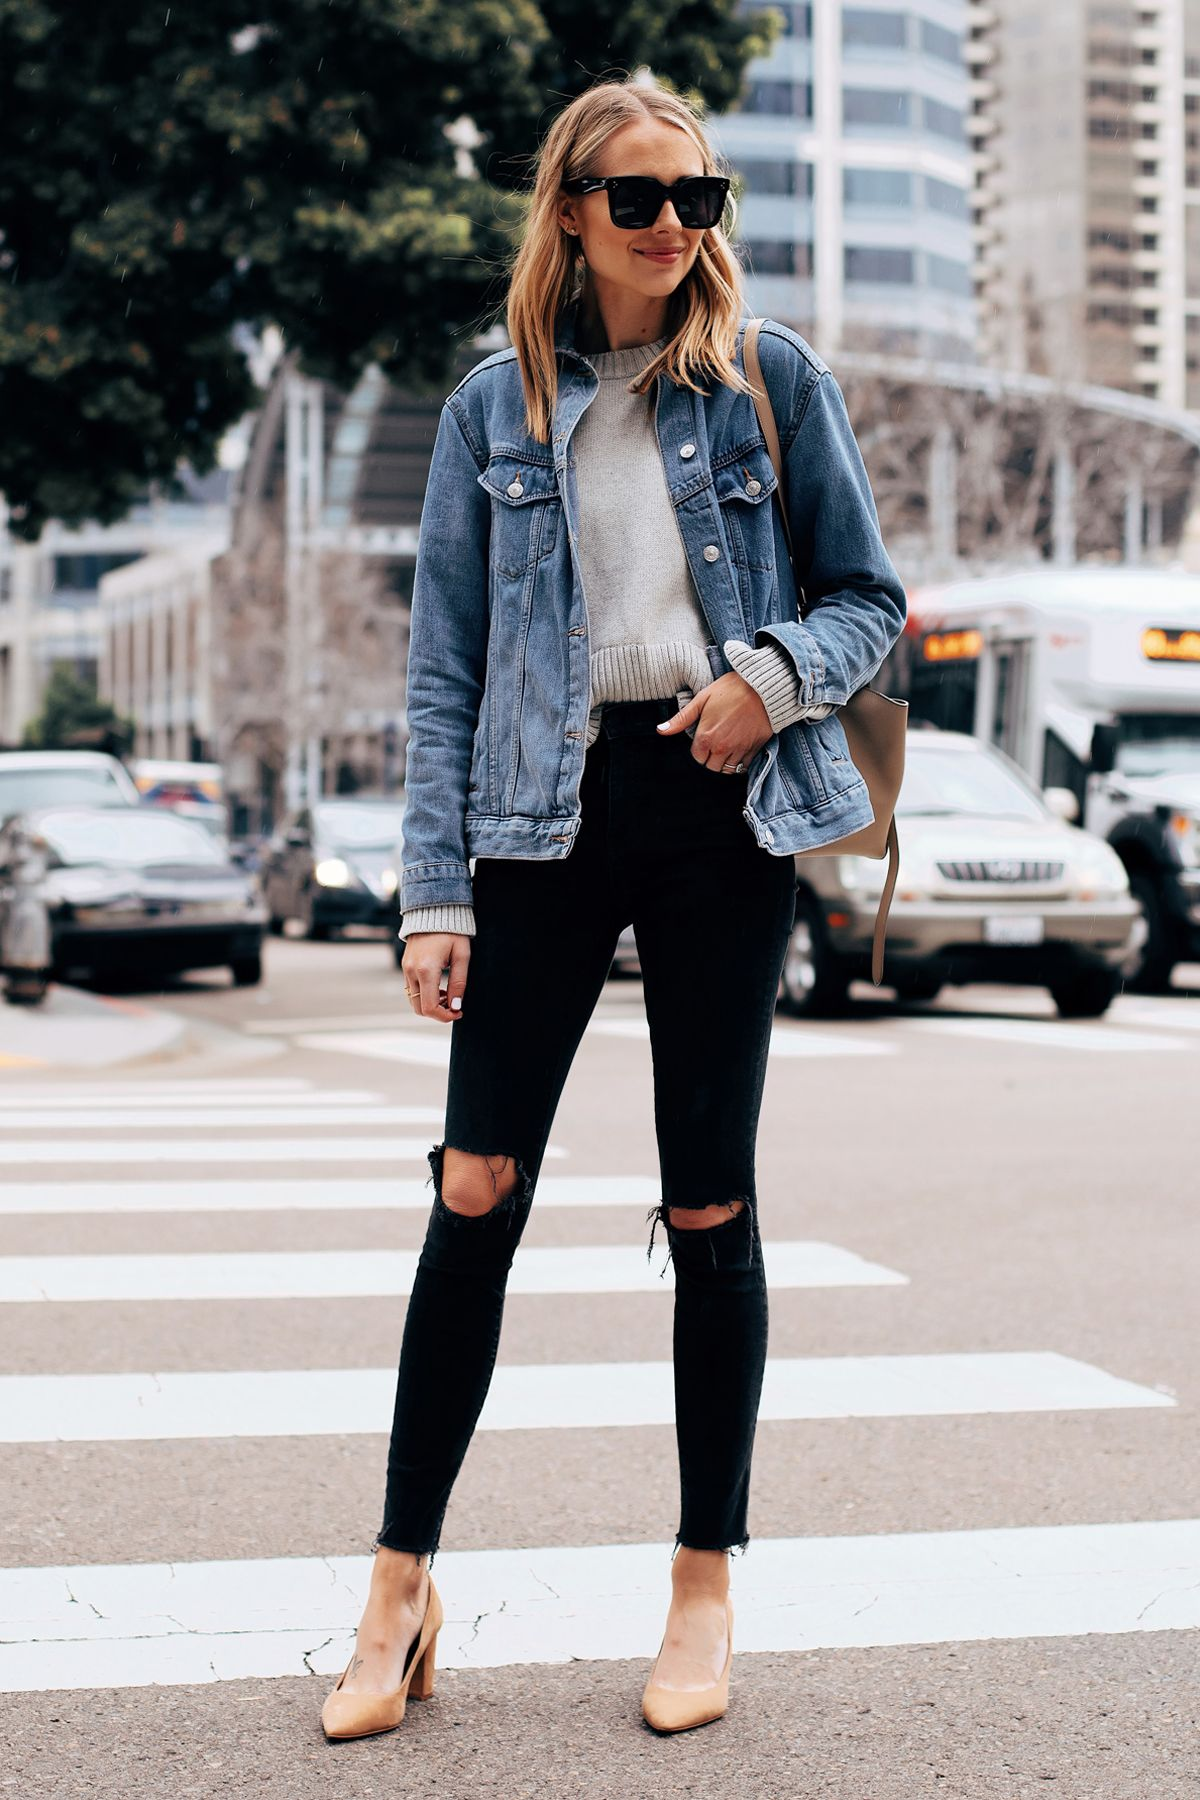 Fashion Jackson Capsule Wardrobe Wearing Topshop Oversized Denim Jacket Everlane Grey Sweater Madewel Black Ripped Skinny Jeans Denim Jacket Outfit Black Jeans [ 1800 x 1200 Pixel ]